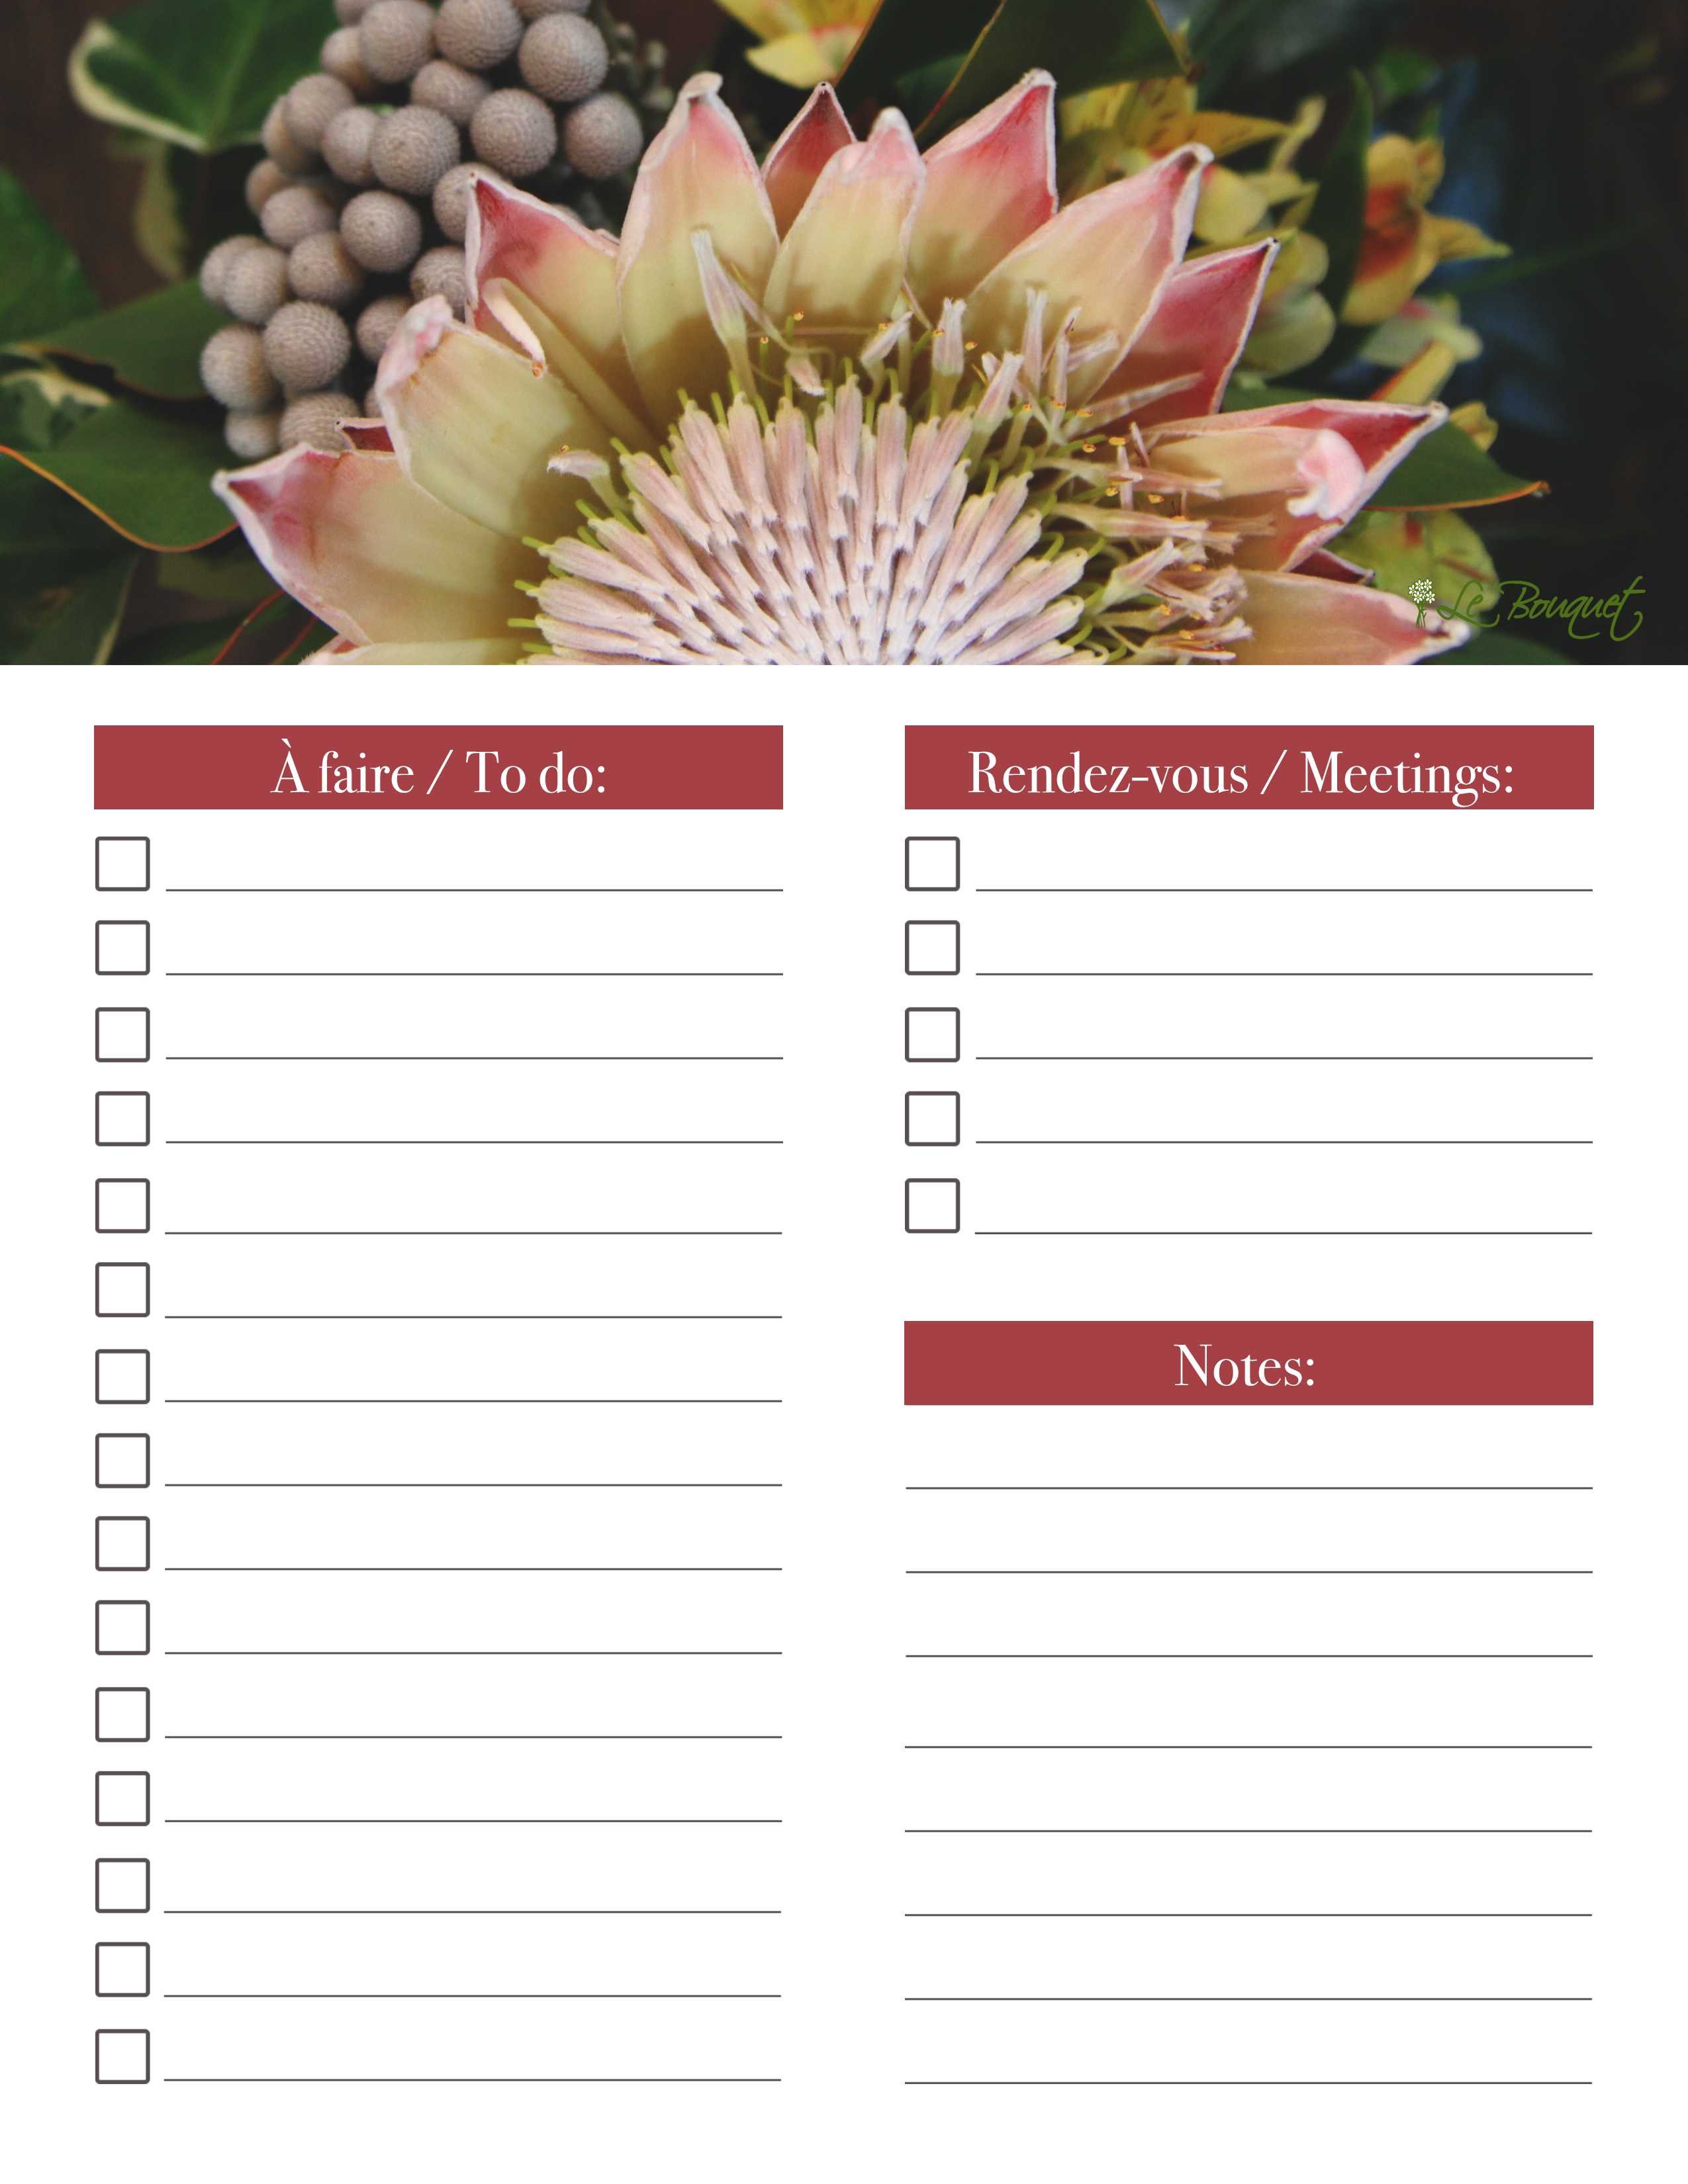 printable daily organizer - Agenda quotidien imprimable - protea